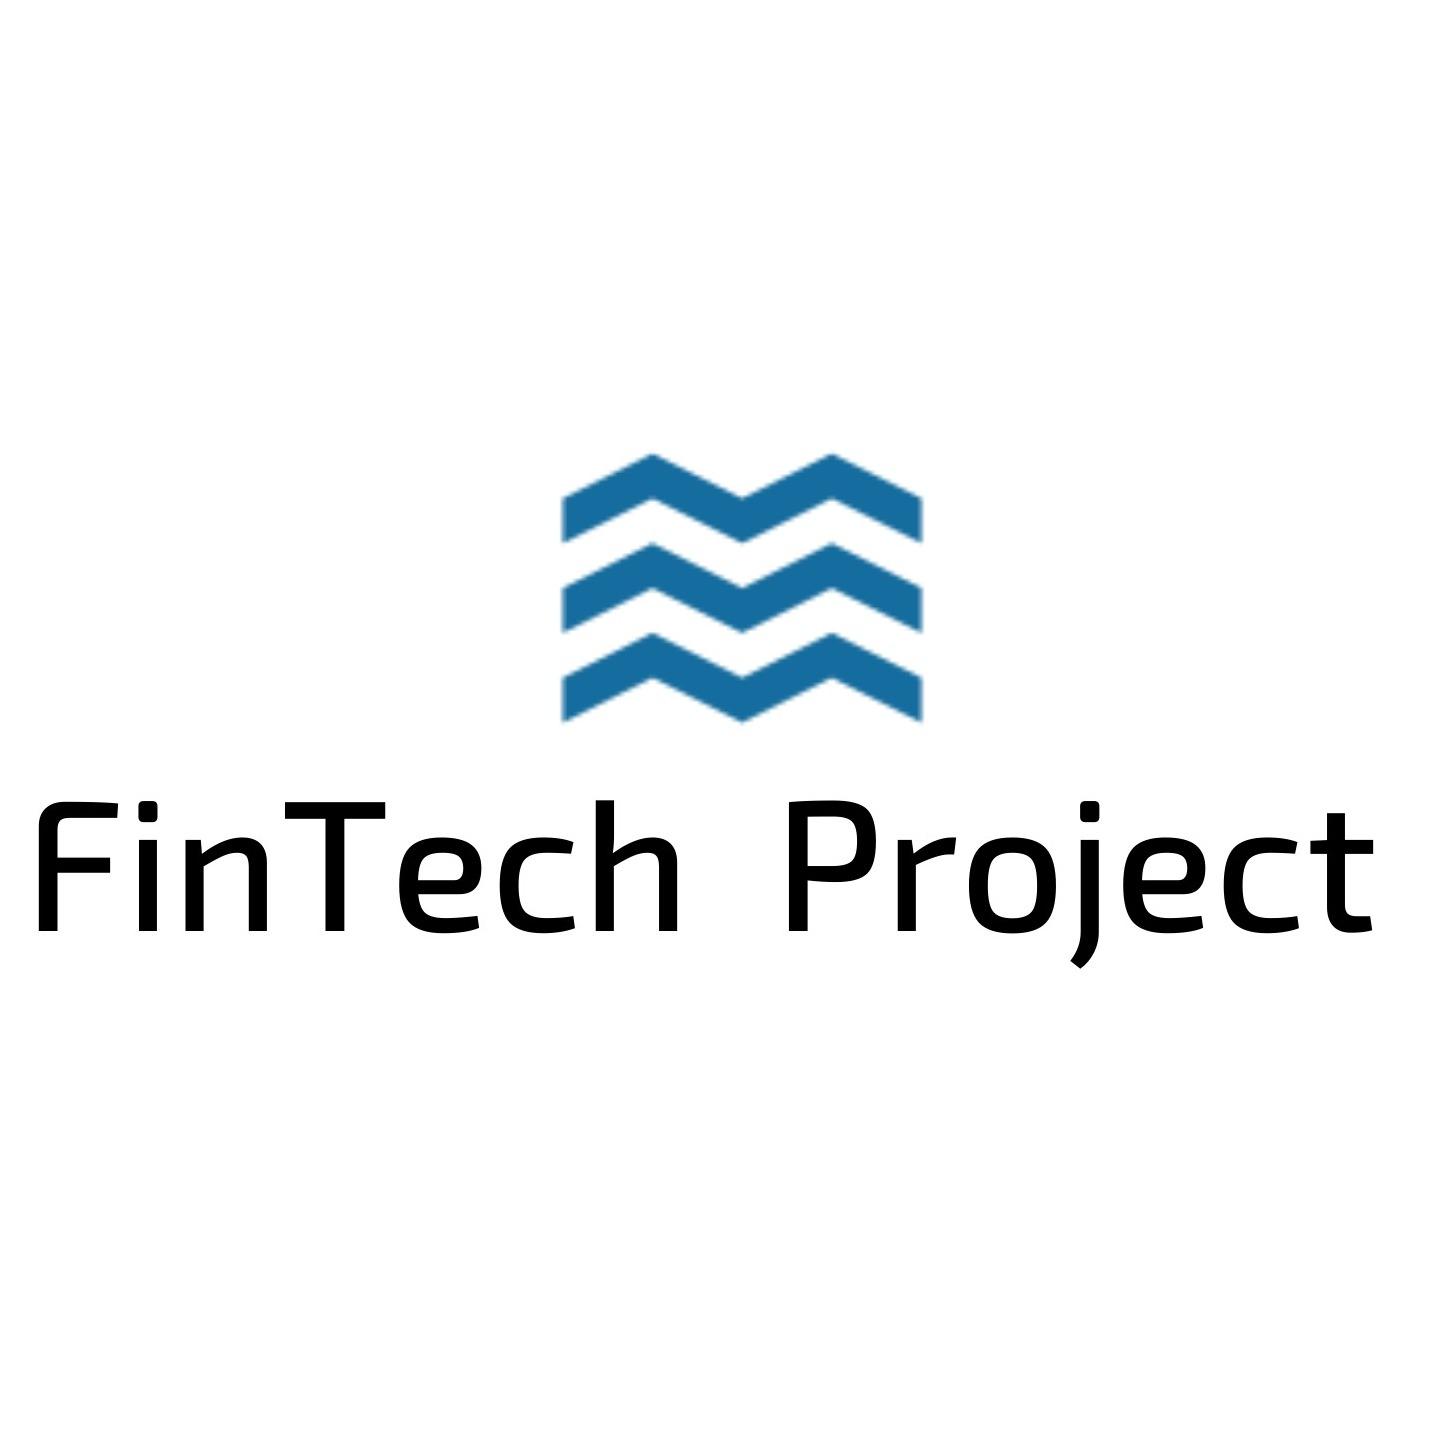 <p>Justice Team FinTech Project: Bank Bonus Program </p>